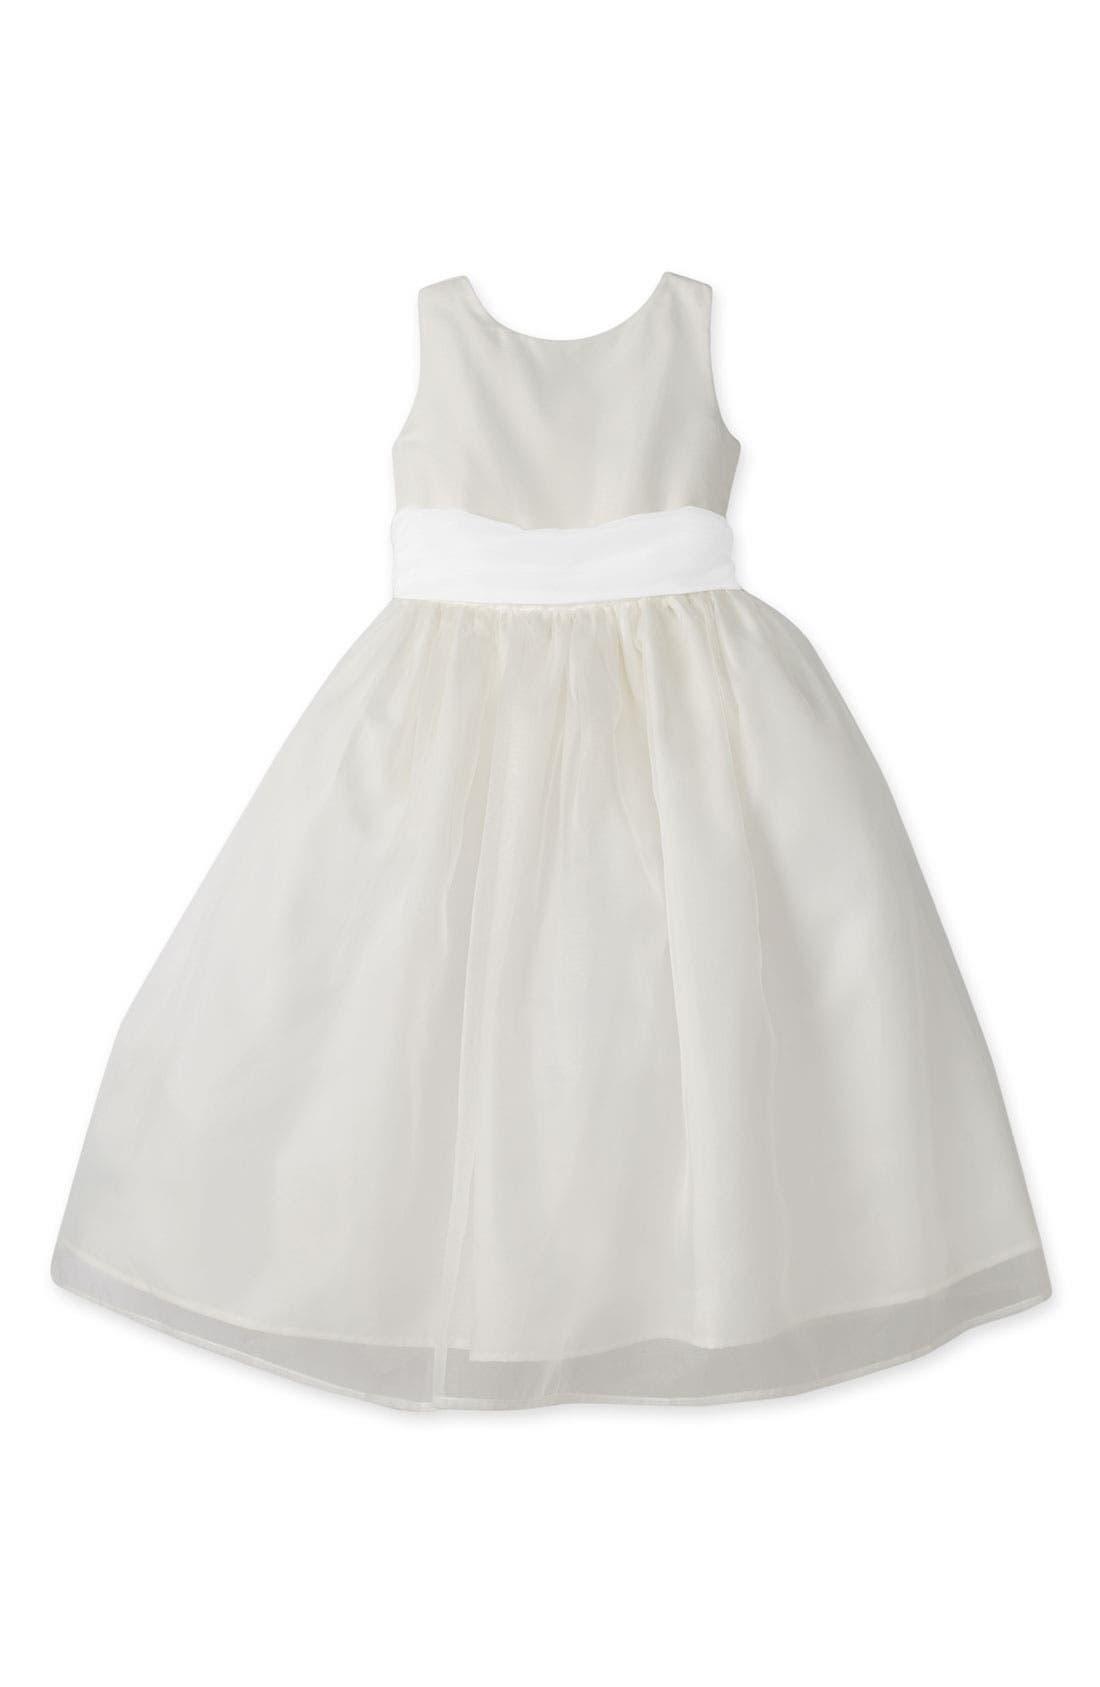 276b20142c9 Baby Girls  Clothing  Dresses